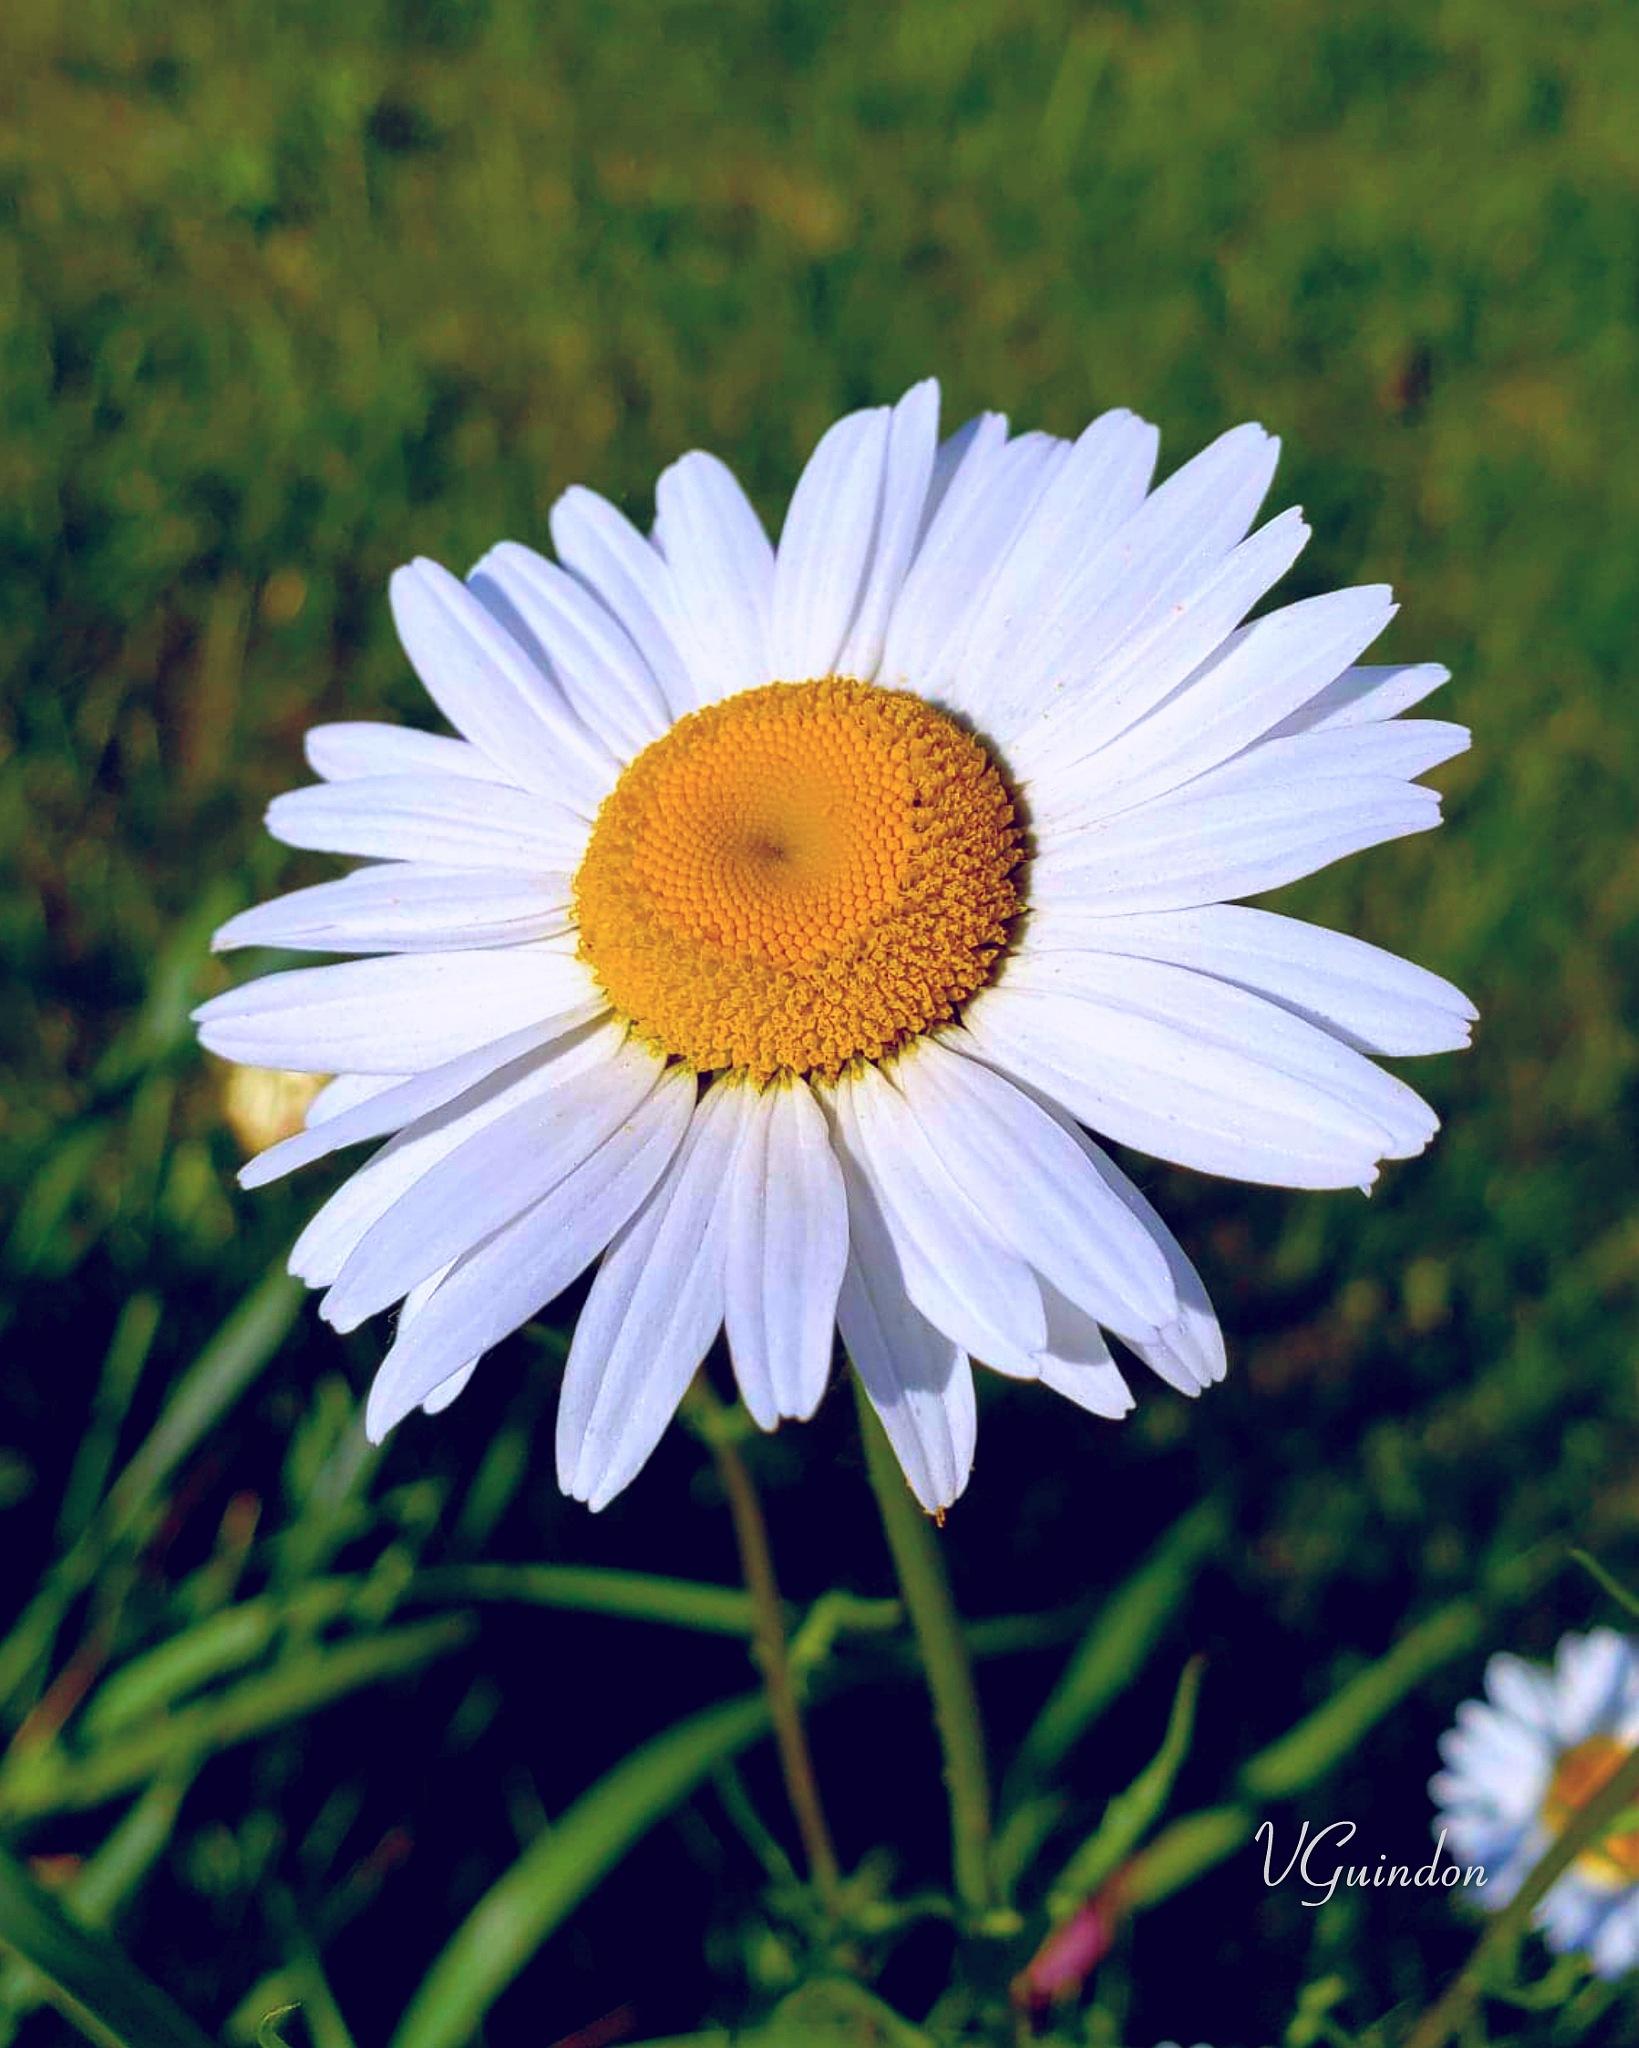 Daisy by VGuindon